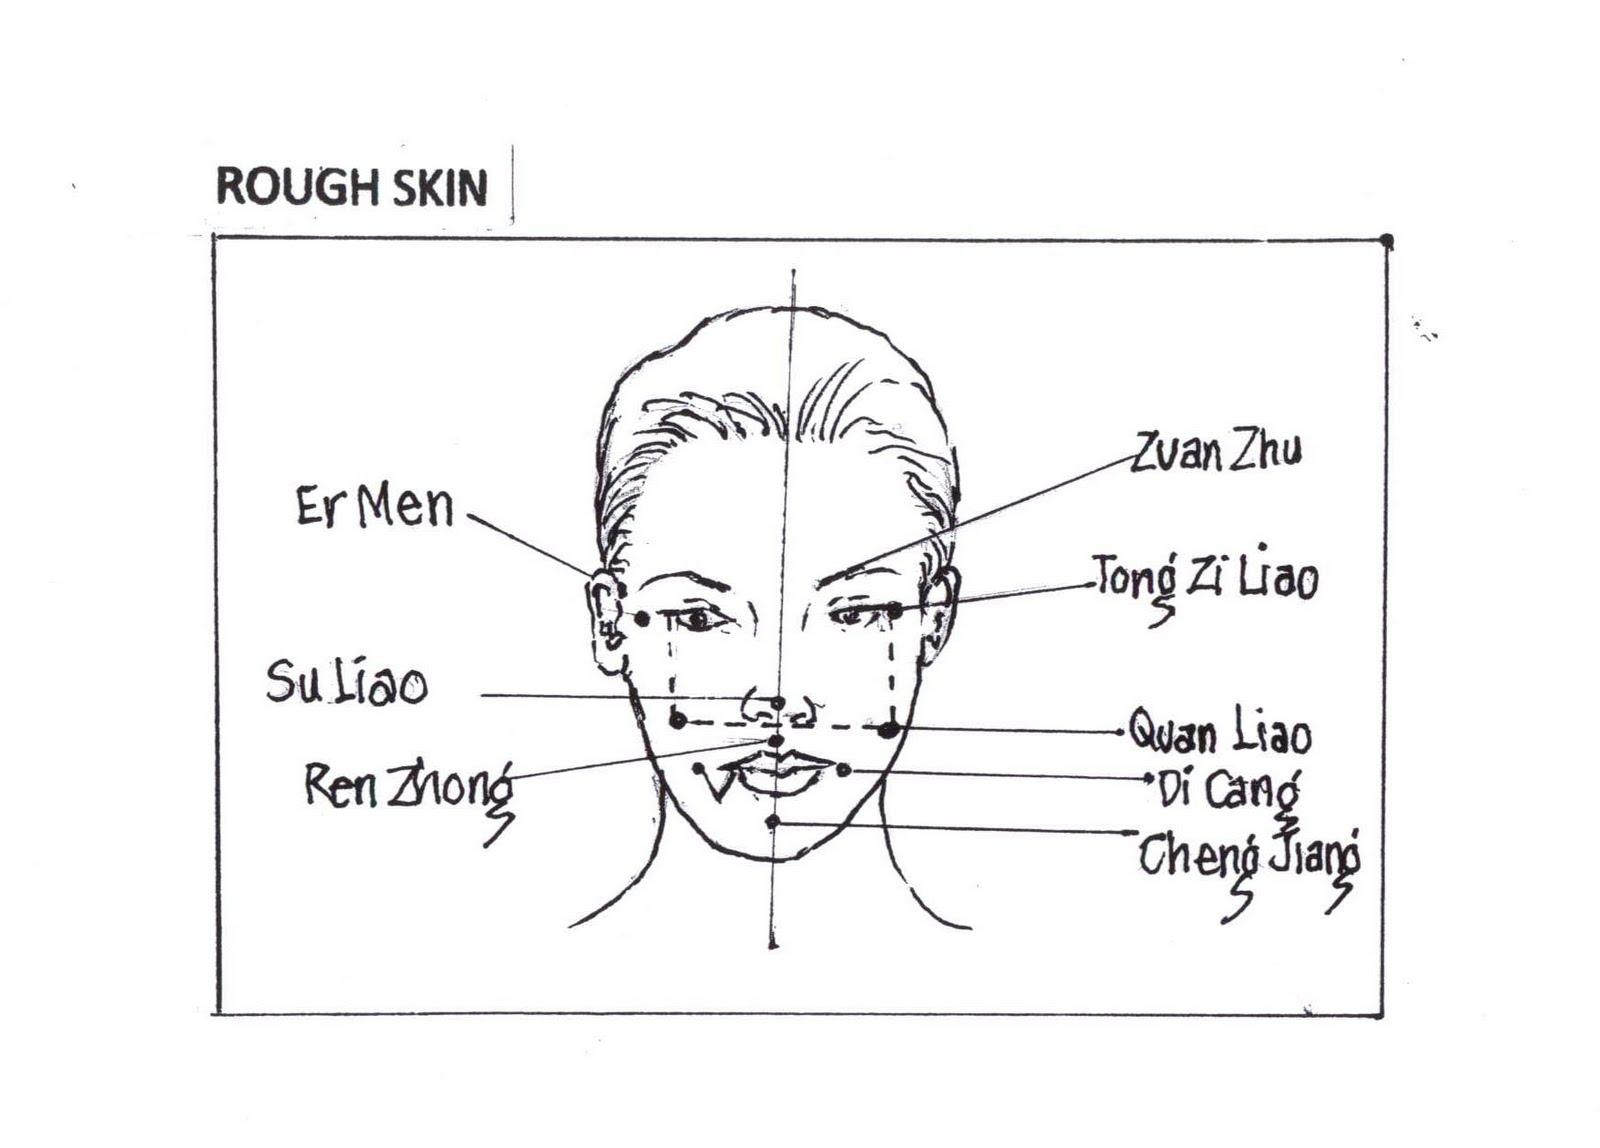 055426 pcmc (pacific complementary medicine center) blog facial massage